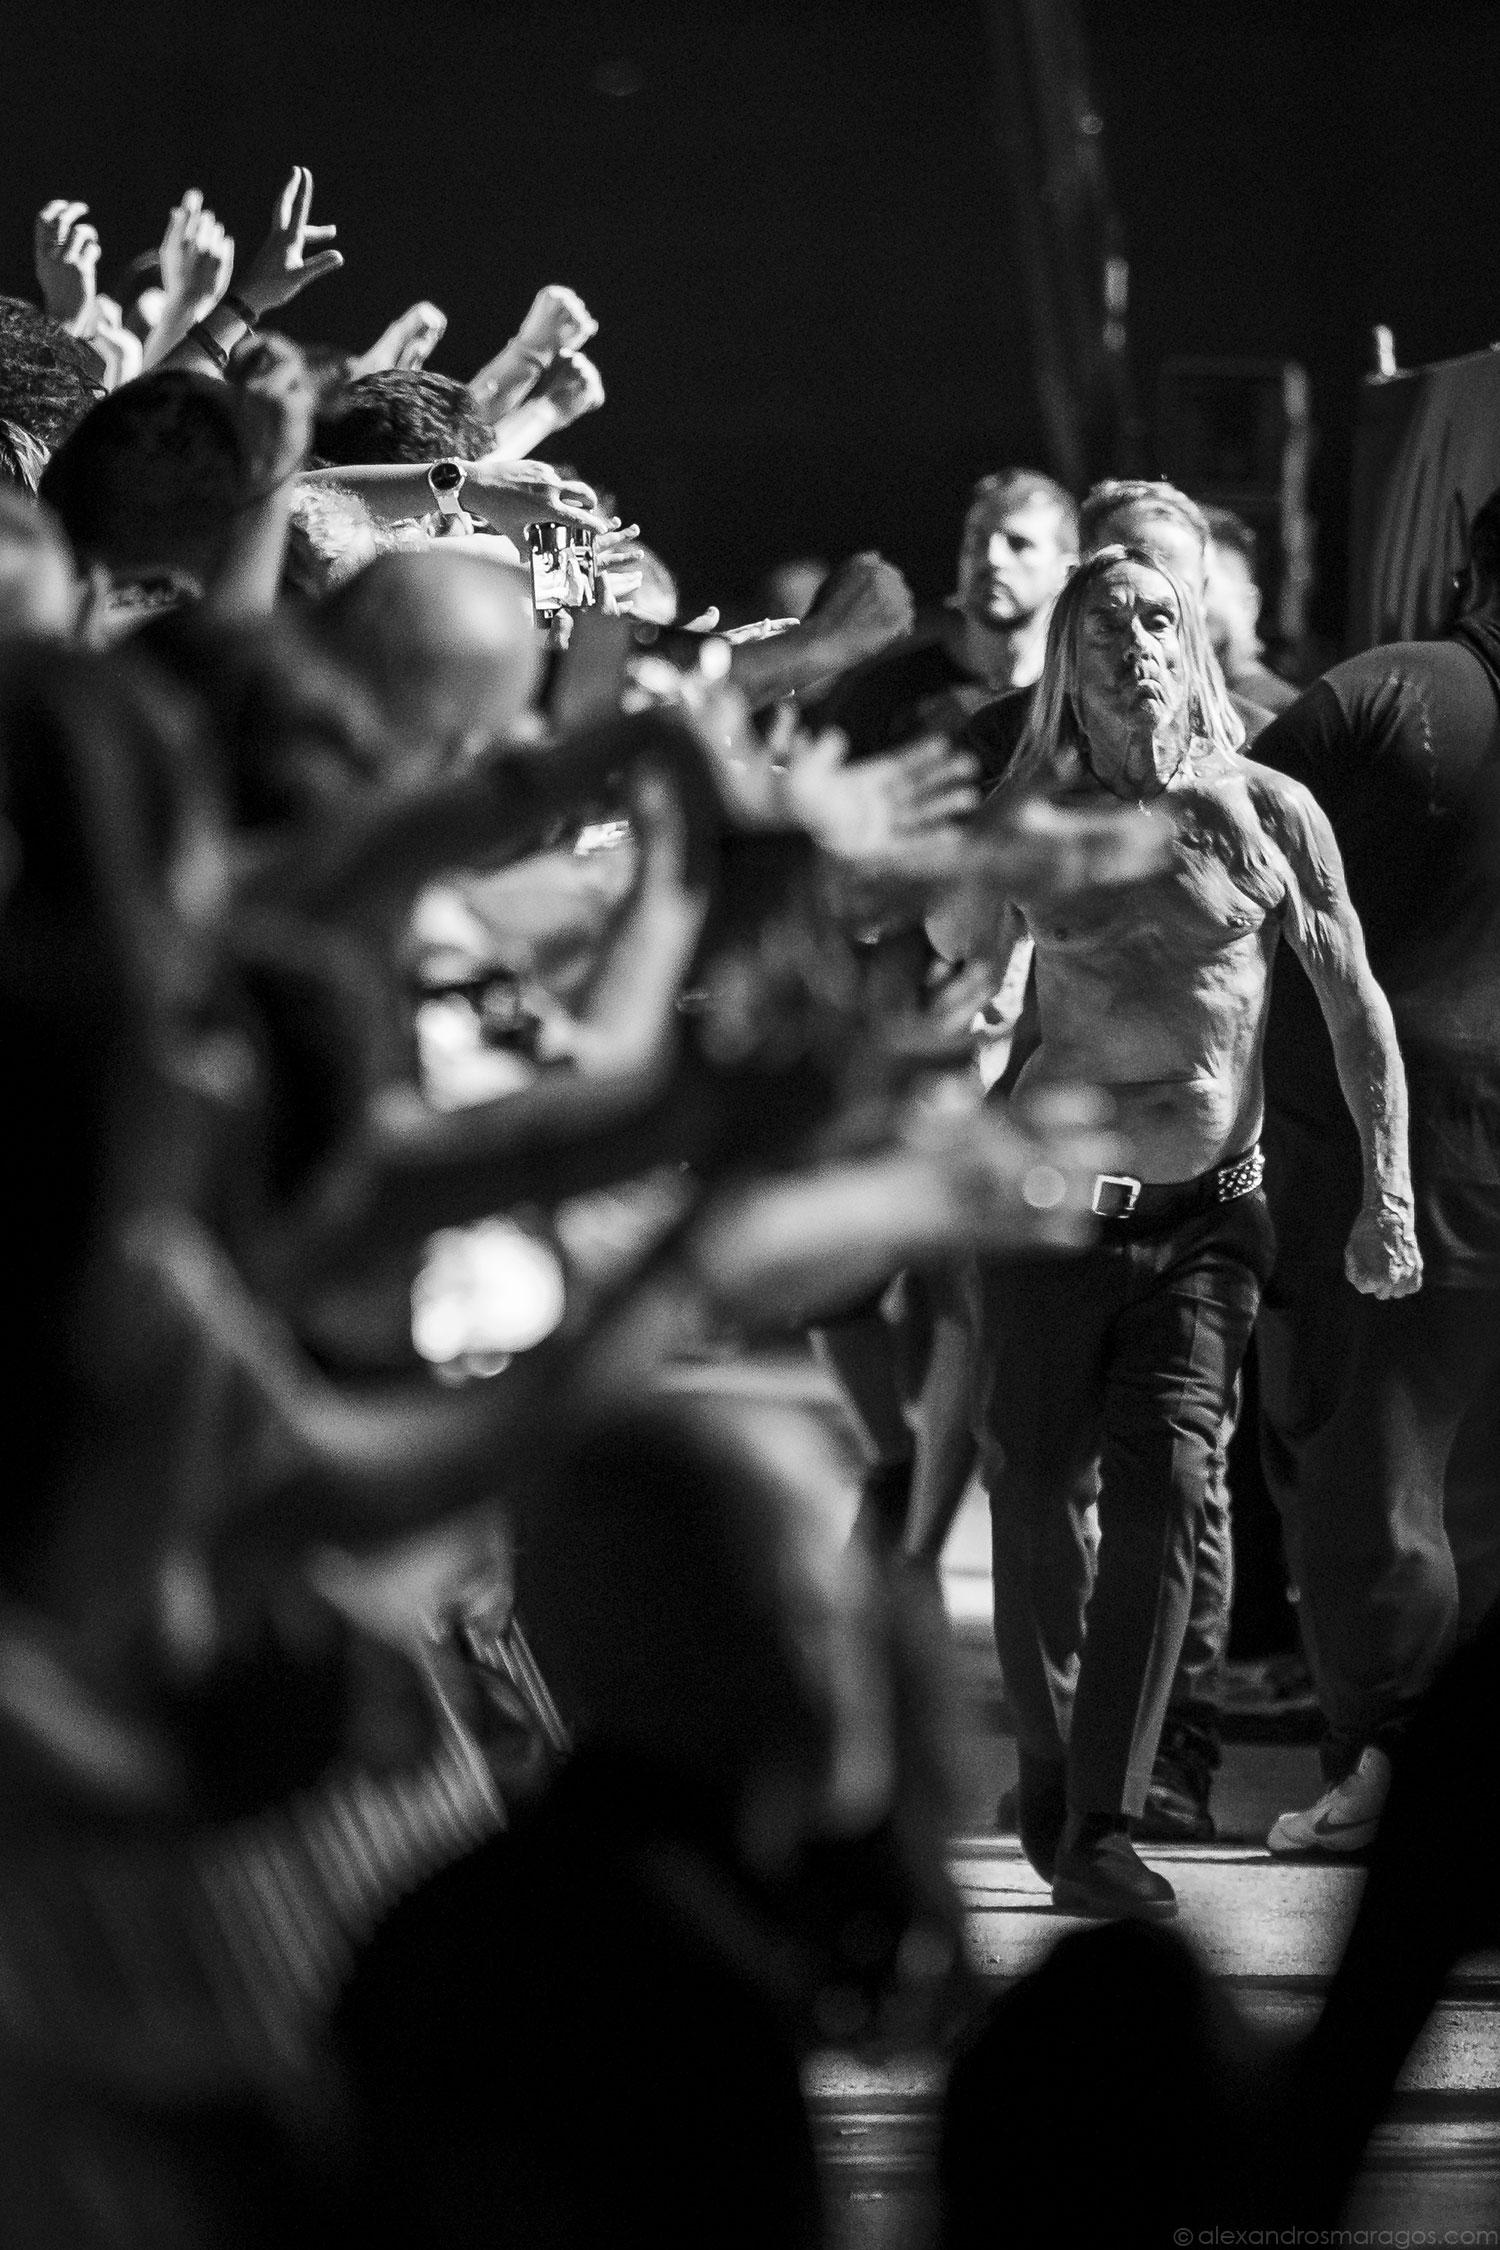 Iggy Pop - Release Athens 2019 | © Alexandros Maragos